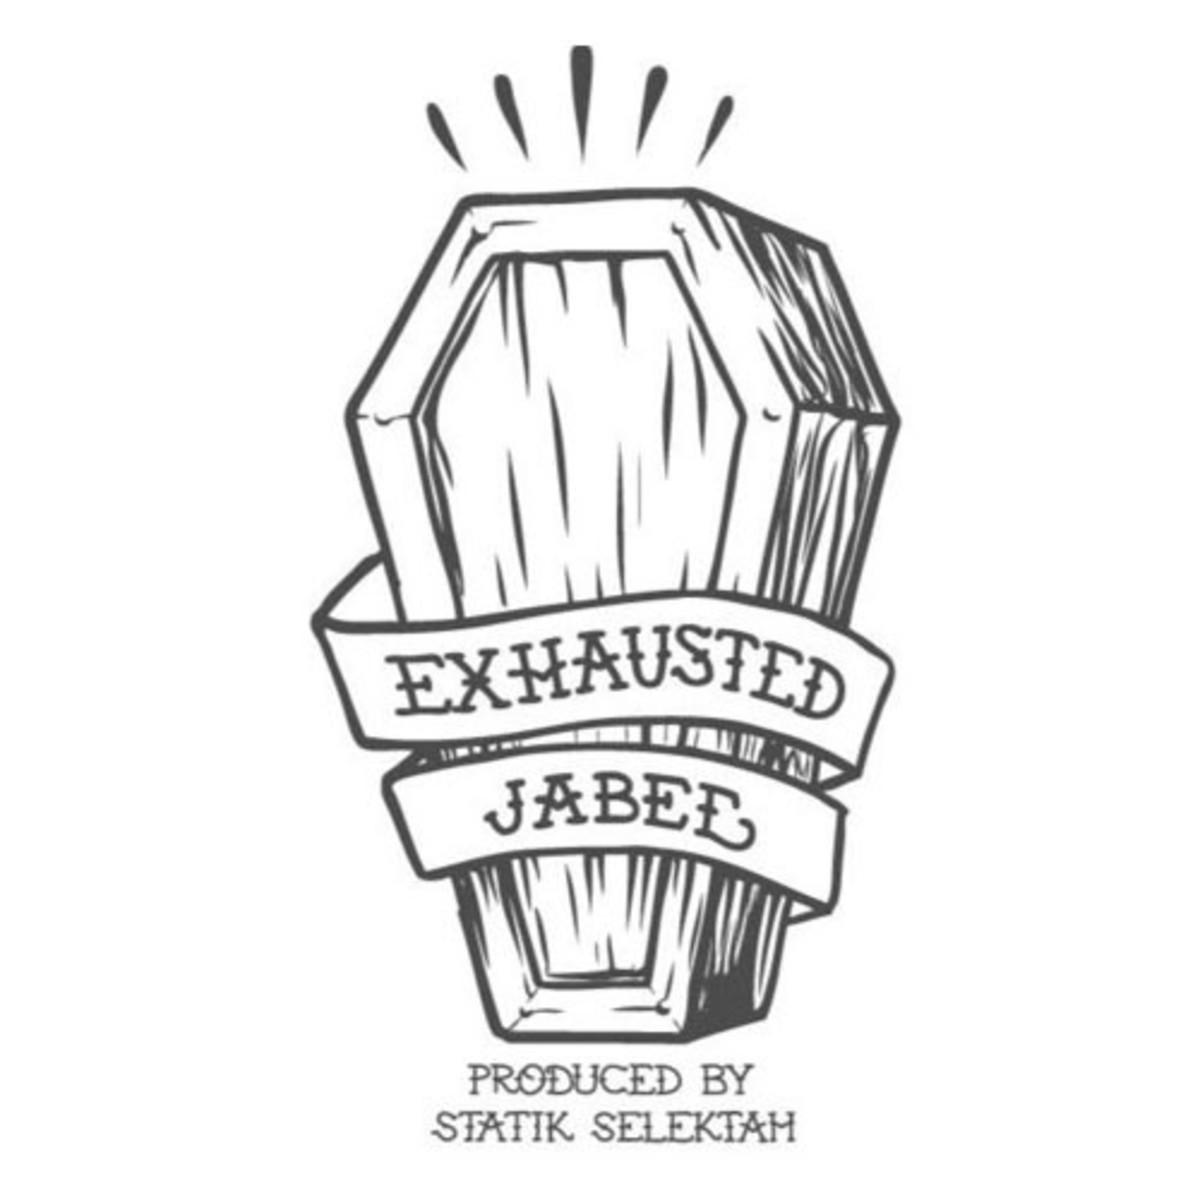 jabee-exhausted.jpg